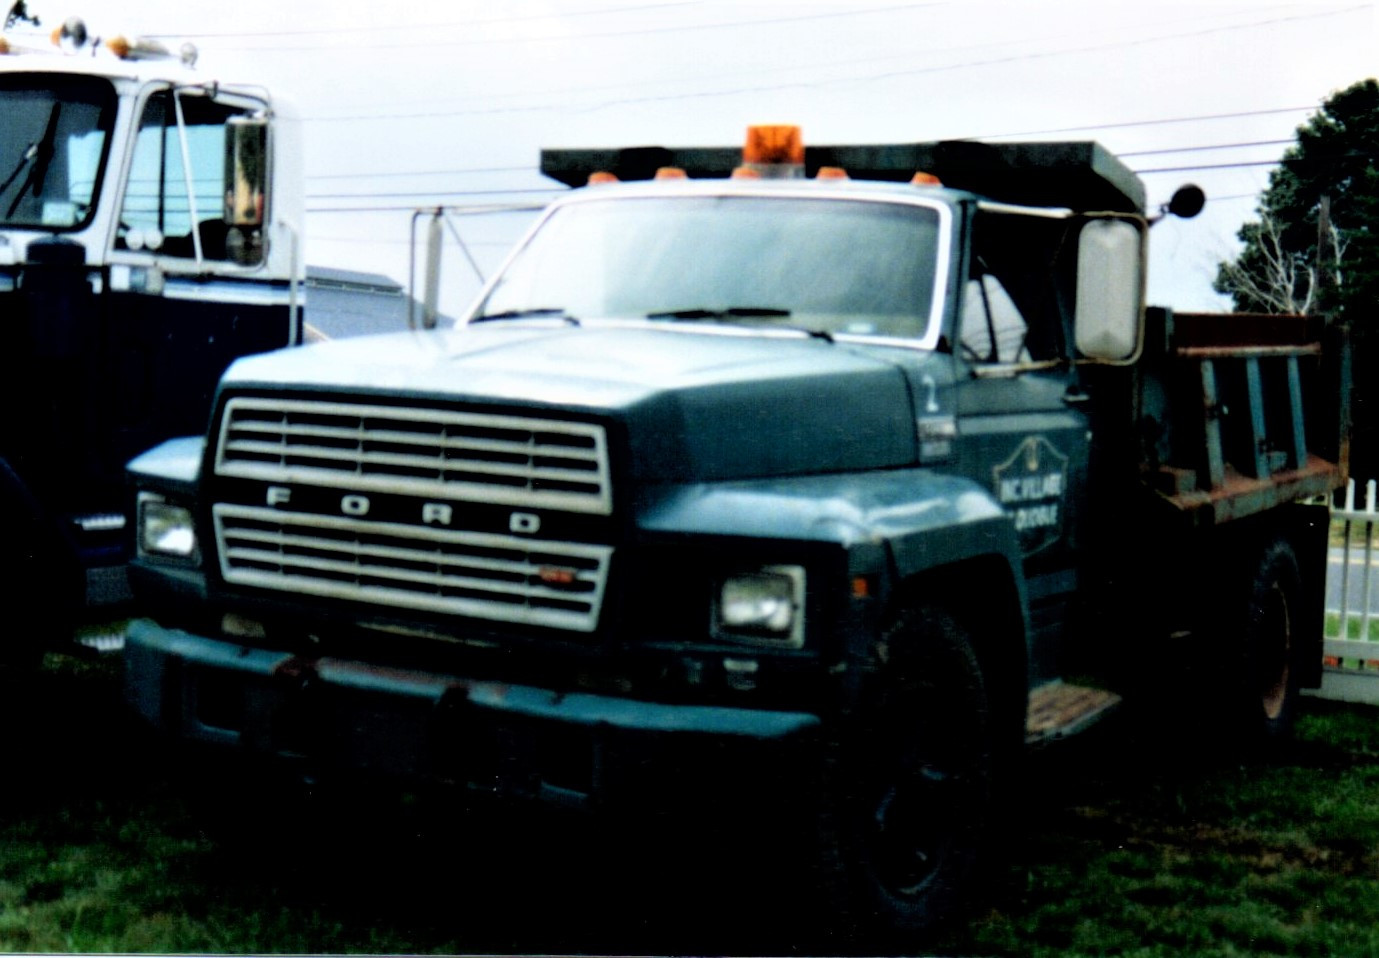 1983 Ford F-700 dump - Steve Wolbert